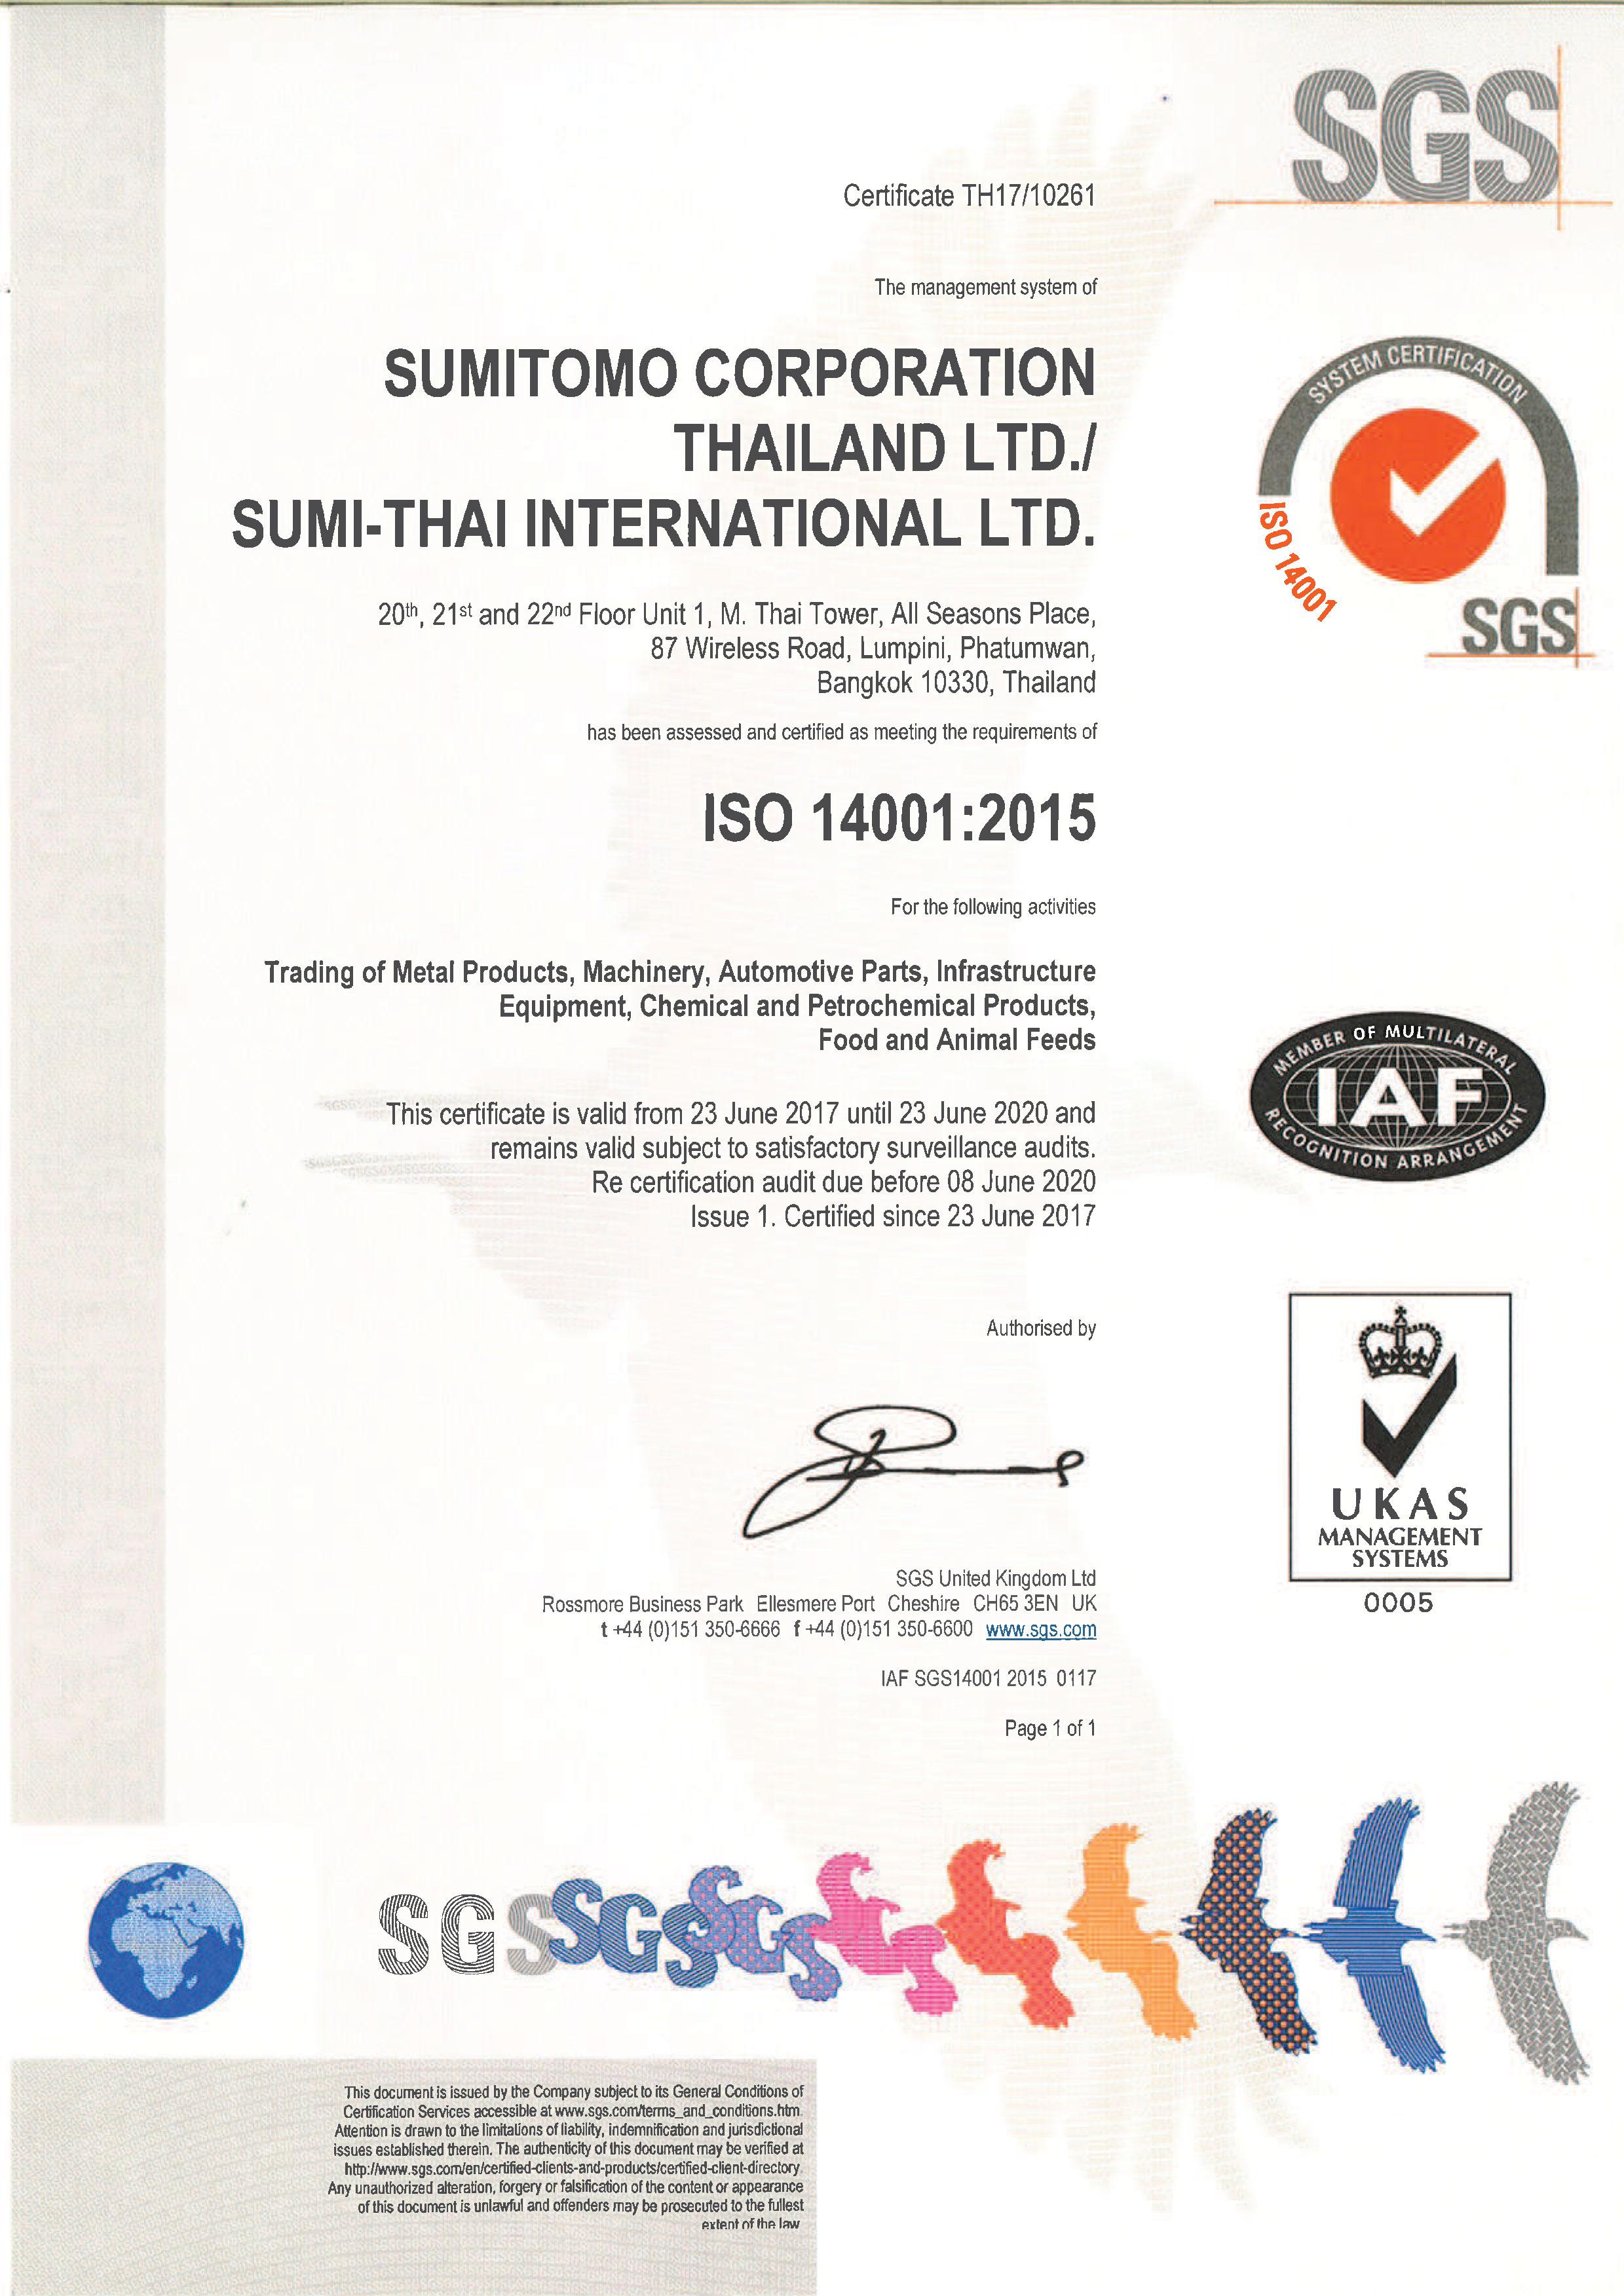 ISO 14001 - Environmental Management System | Sumitomo